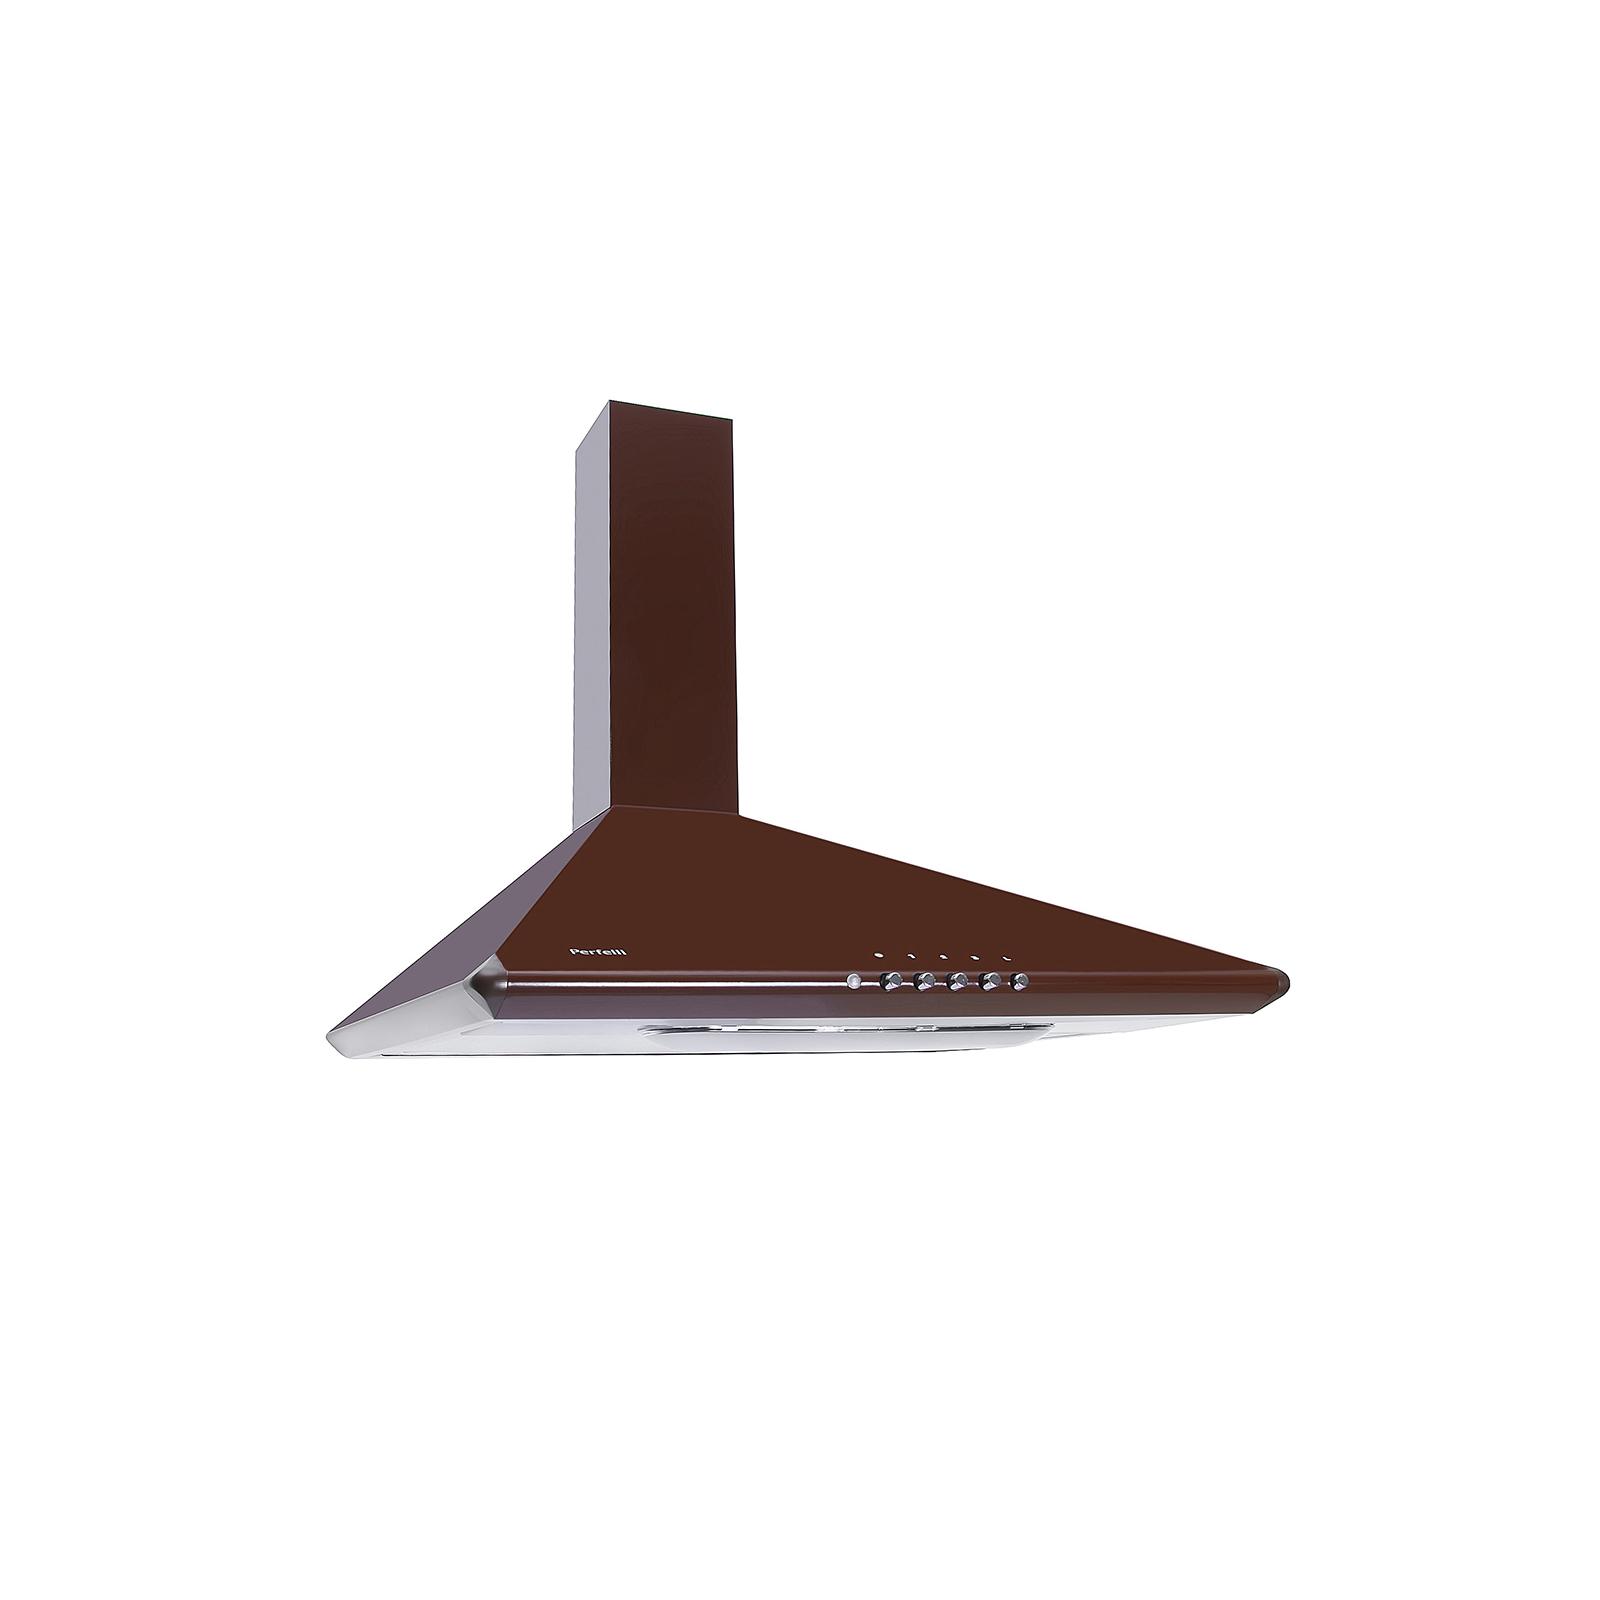 Вытяжка кухонная PERFELLI K 510 BR